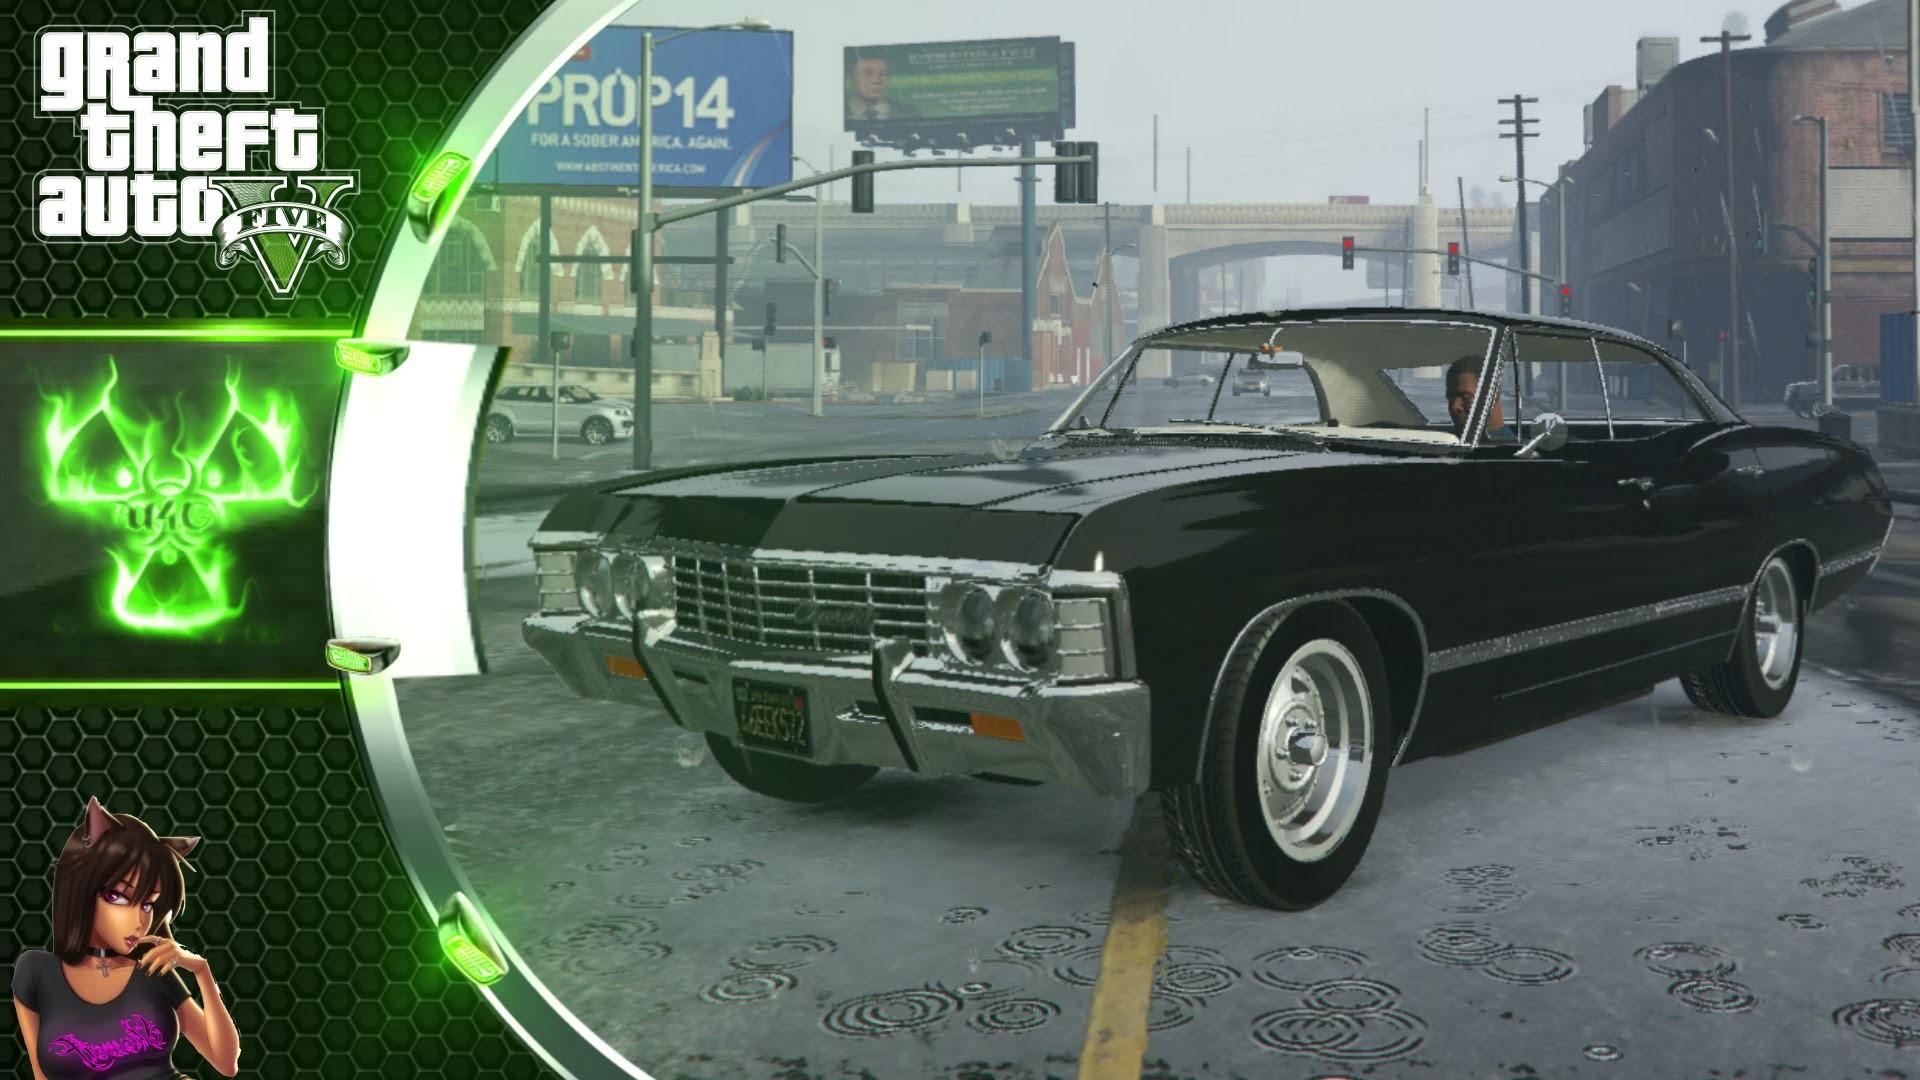 Chevrolet Impala 1967. (Supernatural) GTA 5 Car Mod